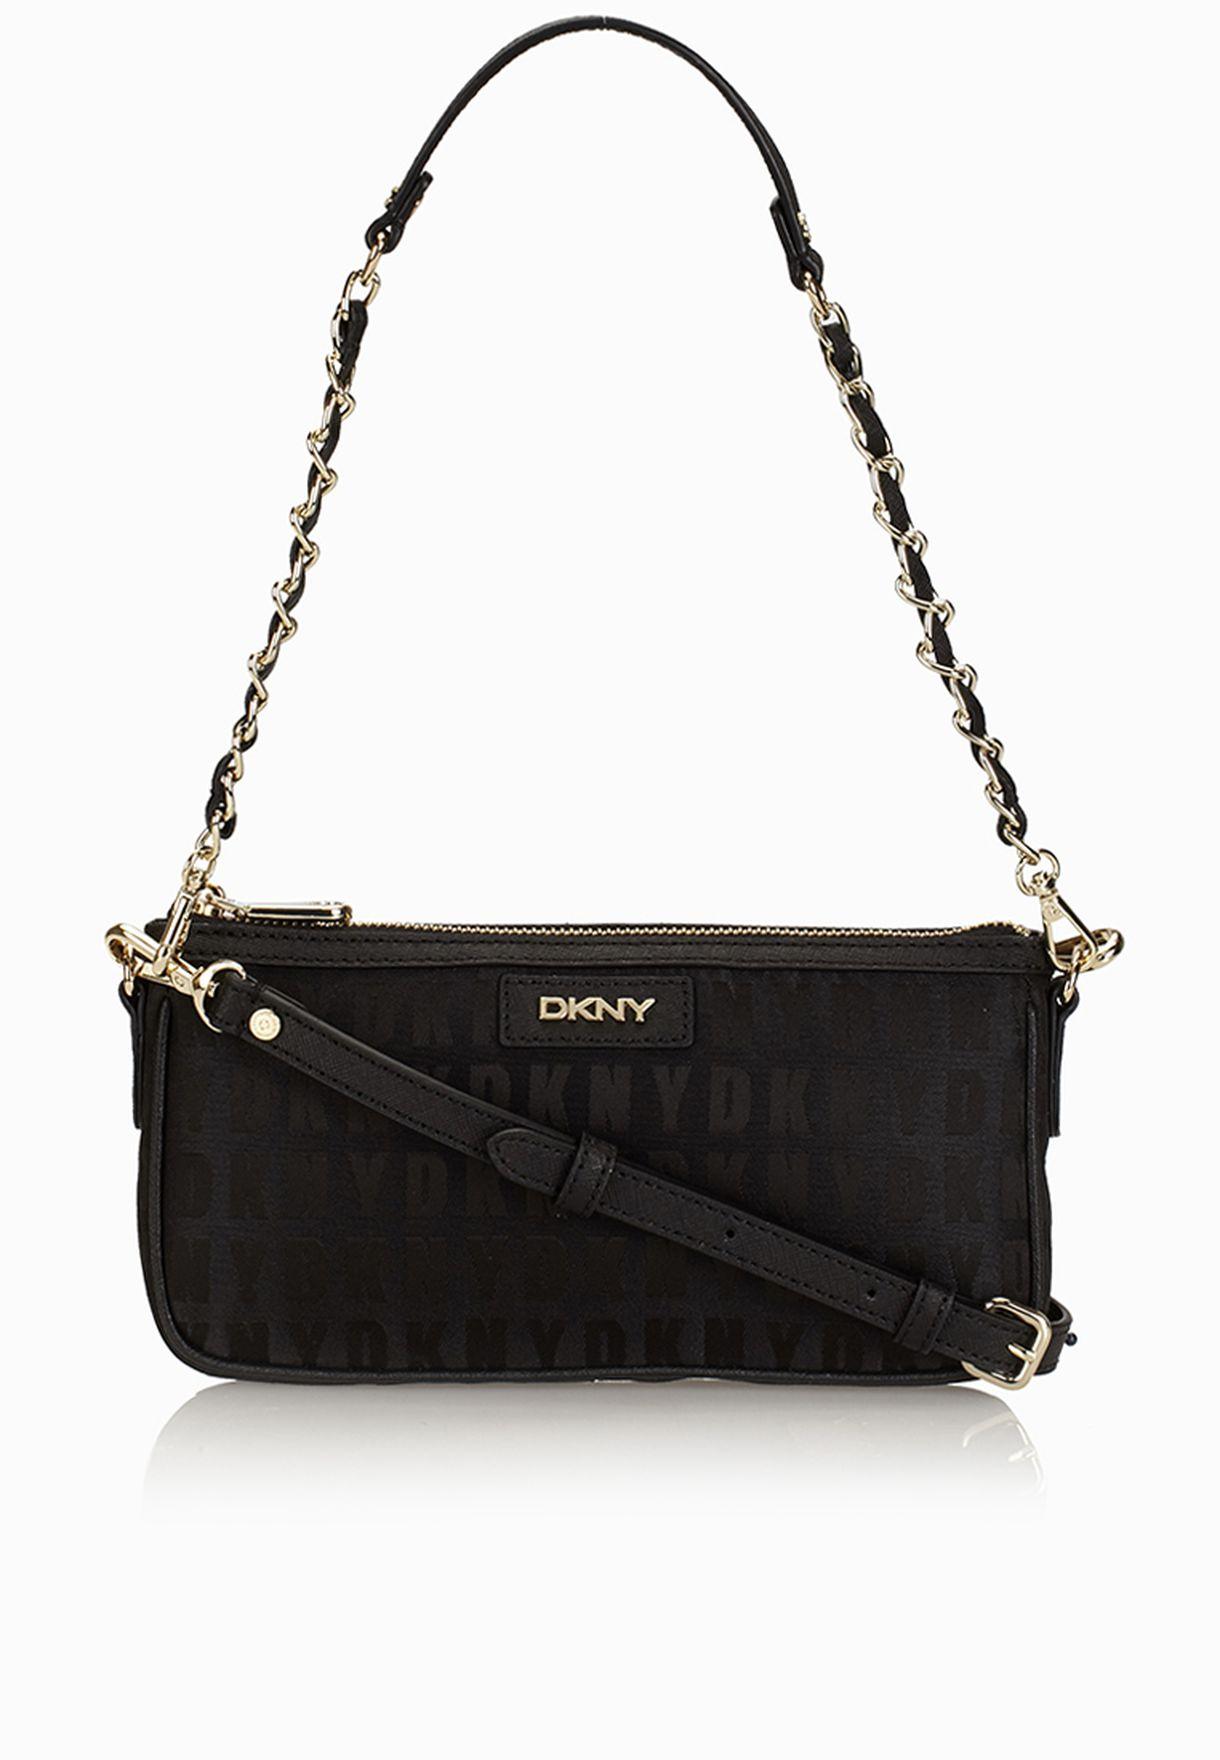 fcbcac00f تسوق حقيبة بحمالة طويلة ماركة دكني لون أسود R9913101 في السعودية ...